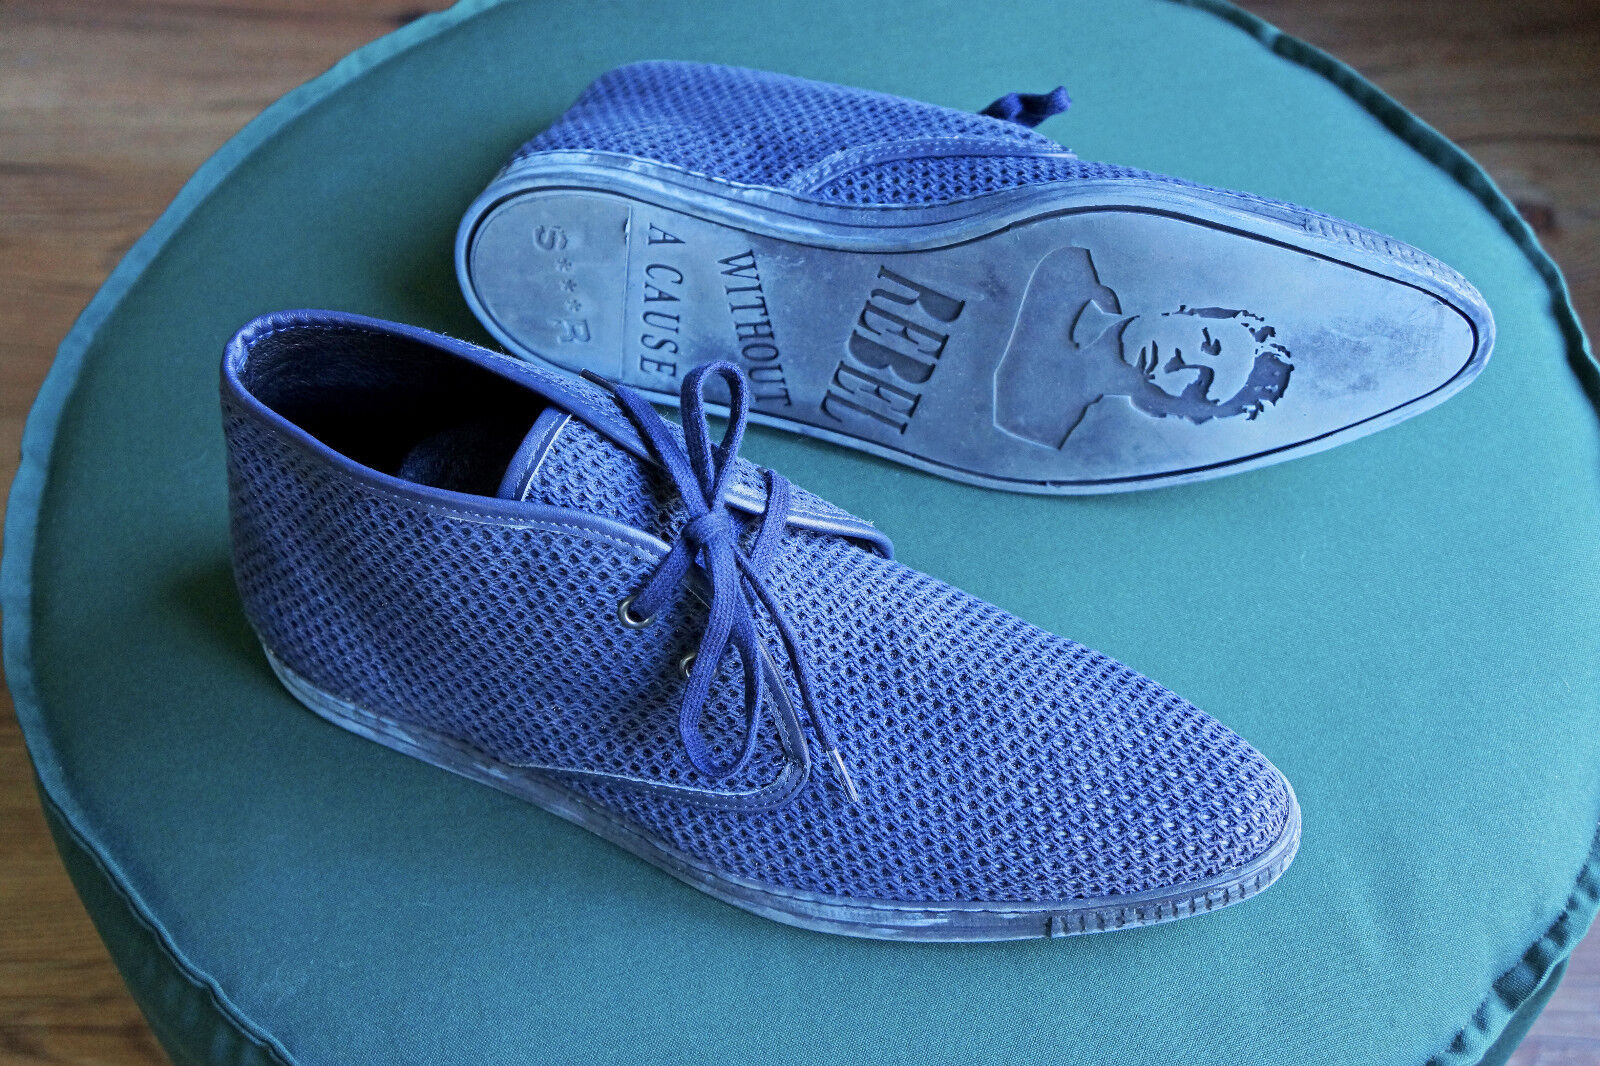 Swear Dean 110 (EU) - blau/blue - Größe/Size (EU) 110 43 - 1x anprobiert - nie getragen! 0bf315